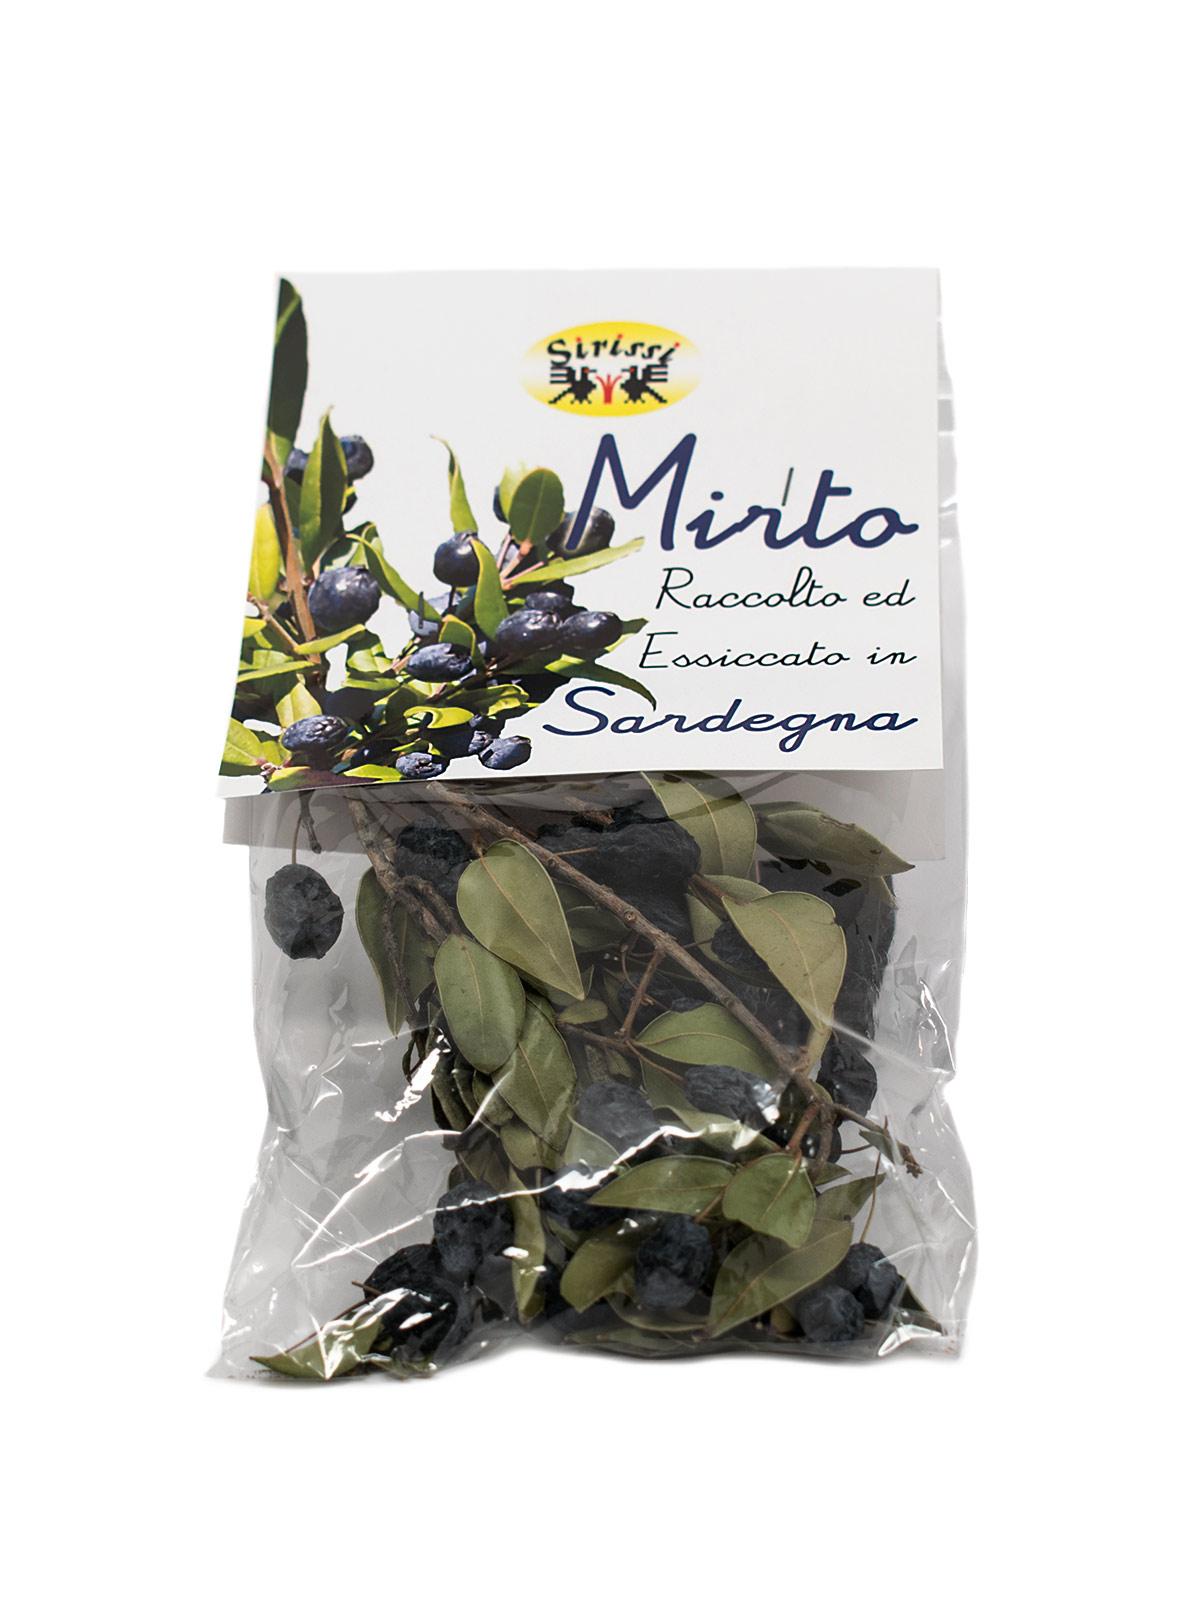 Spezie di Sardegna Dried Myrtle - Pantry - Buon'Italia